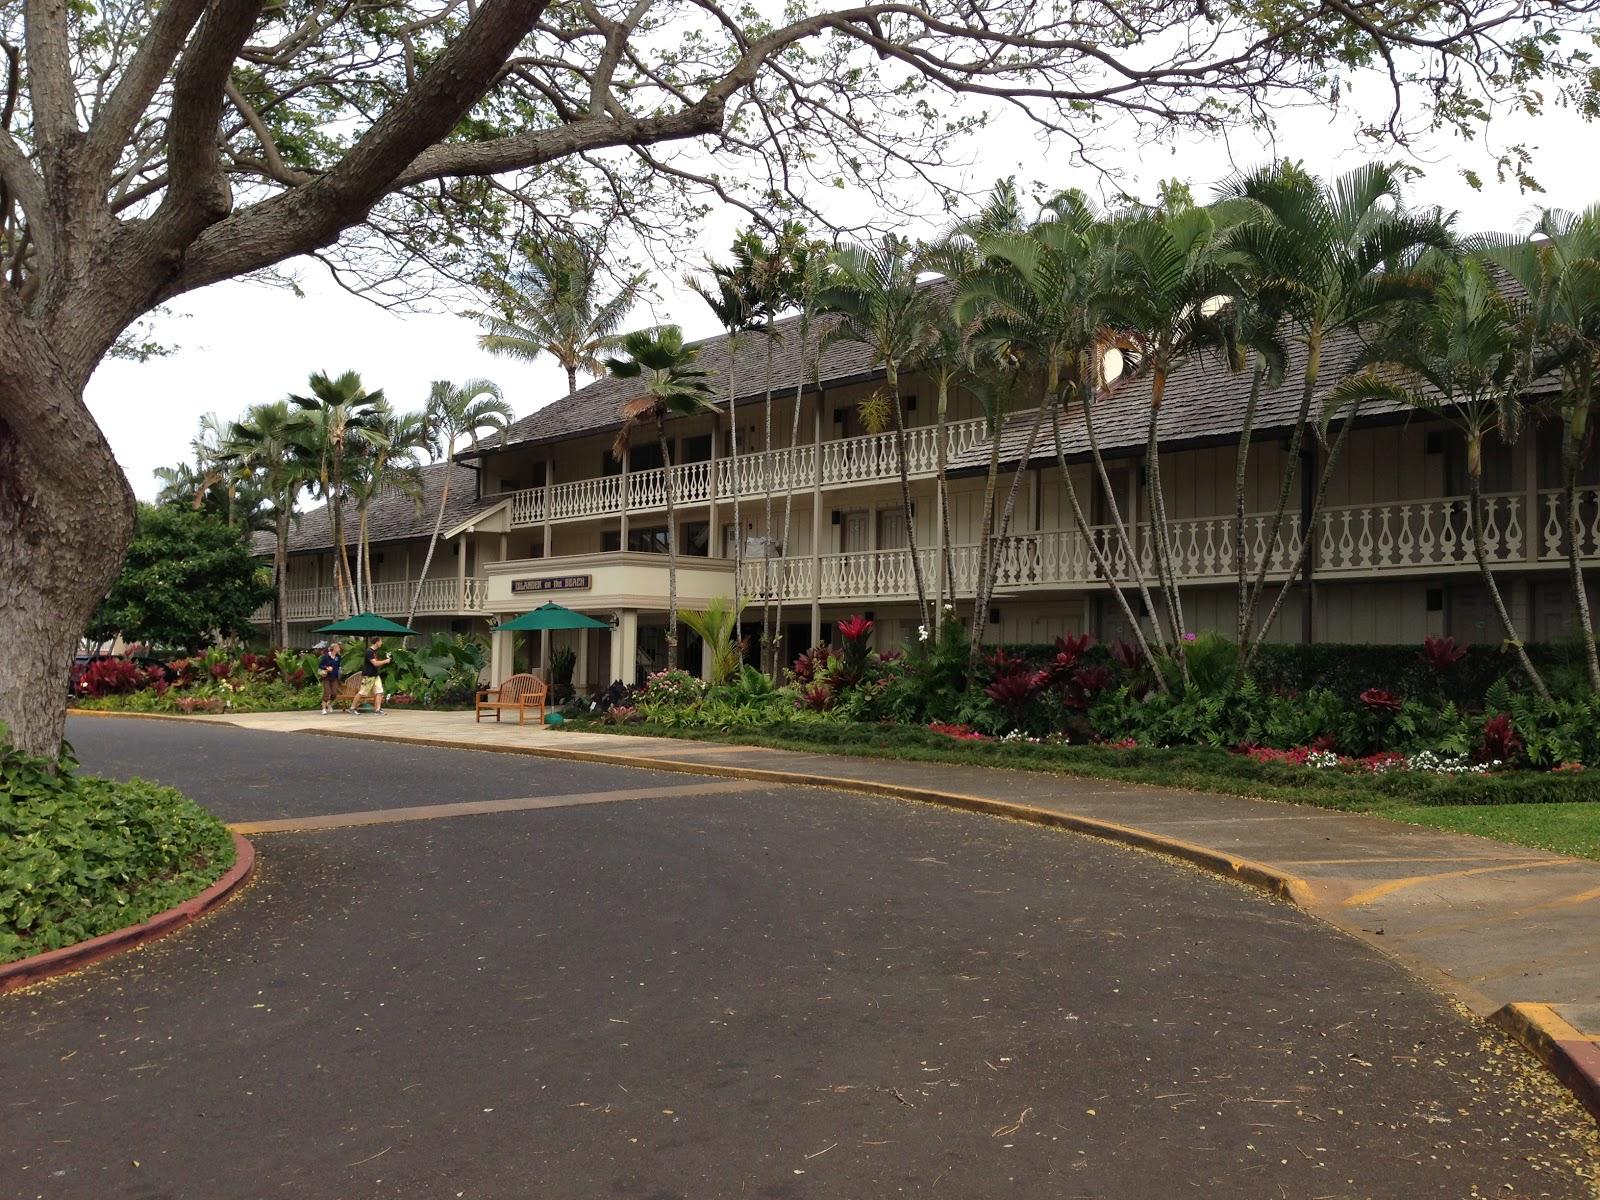 TASTE OF HAWAII: KILAUEA FISH MARKET - KAPAA, KAUAI